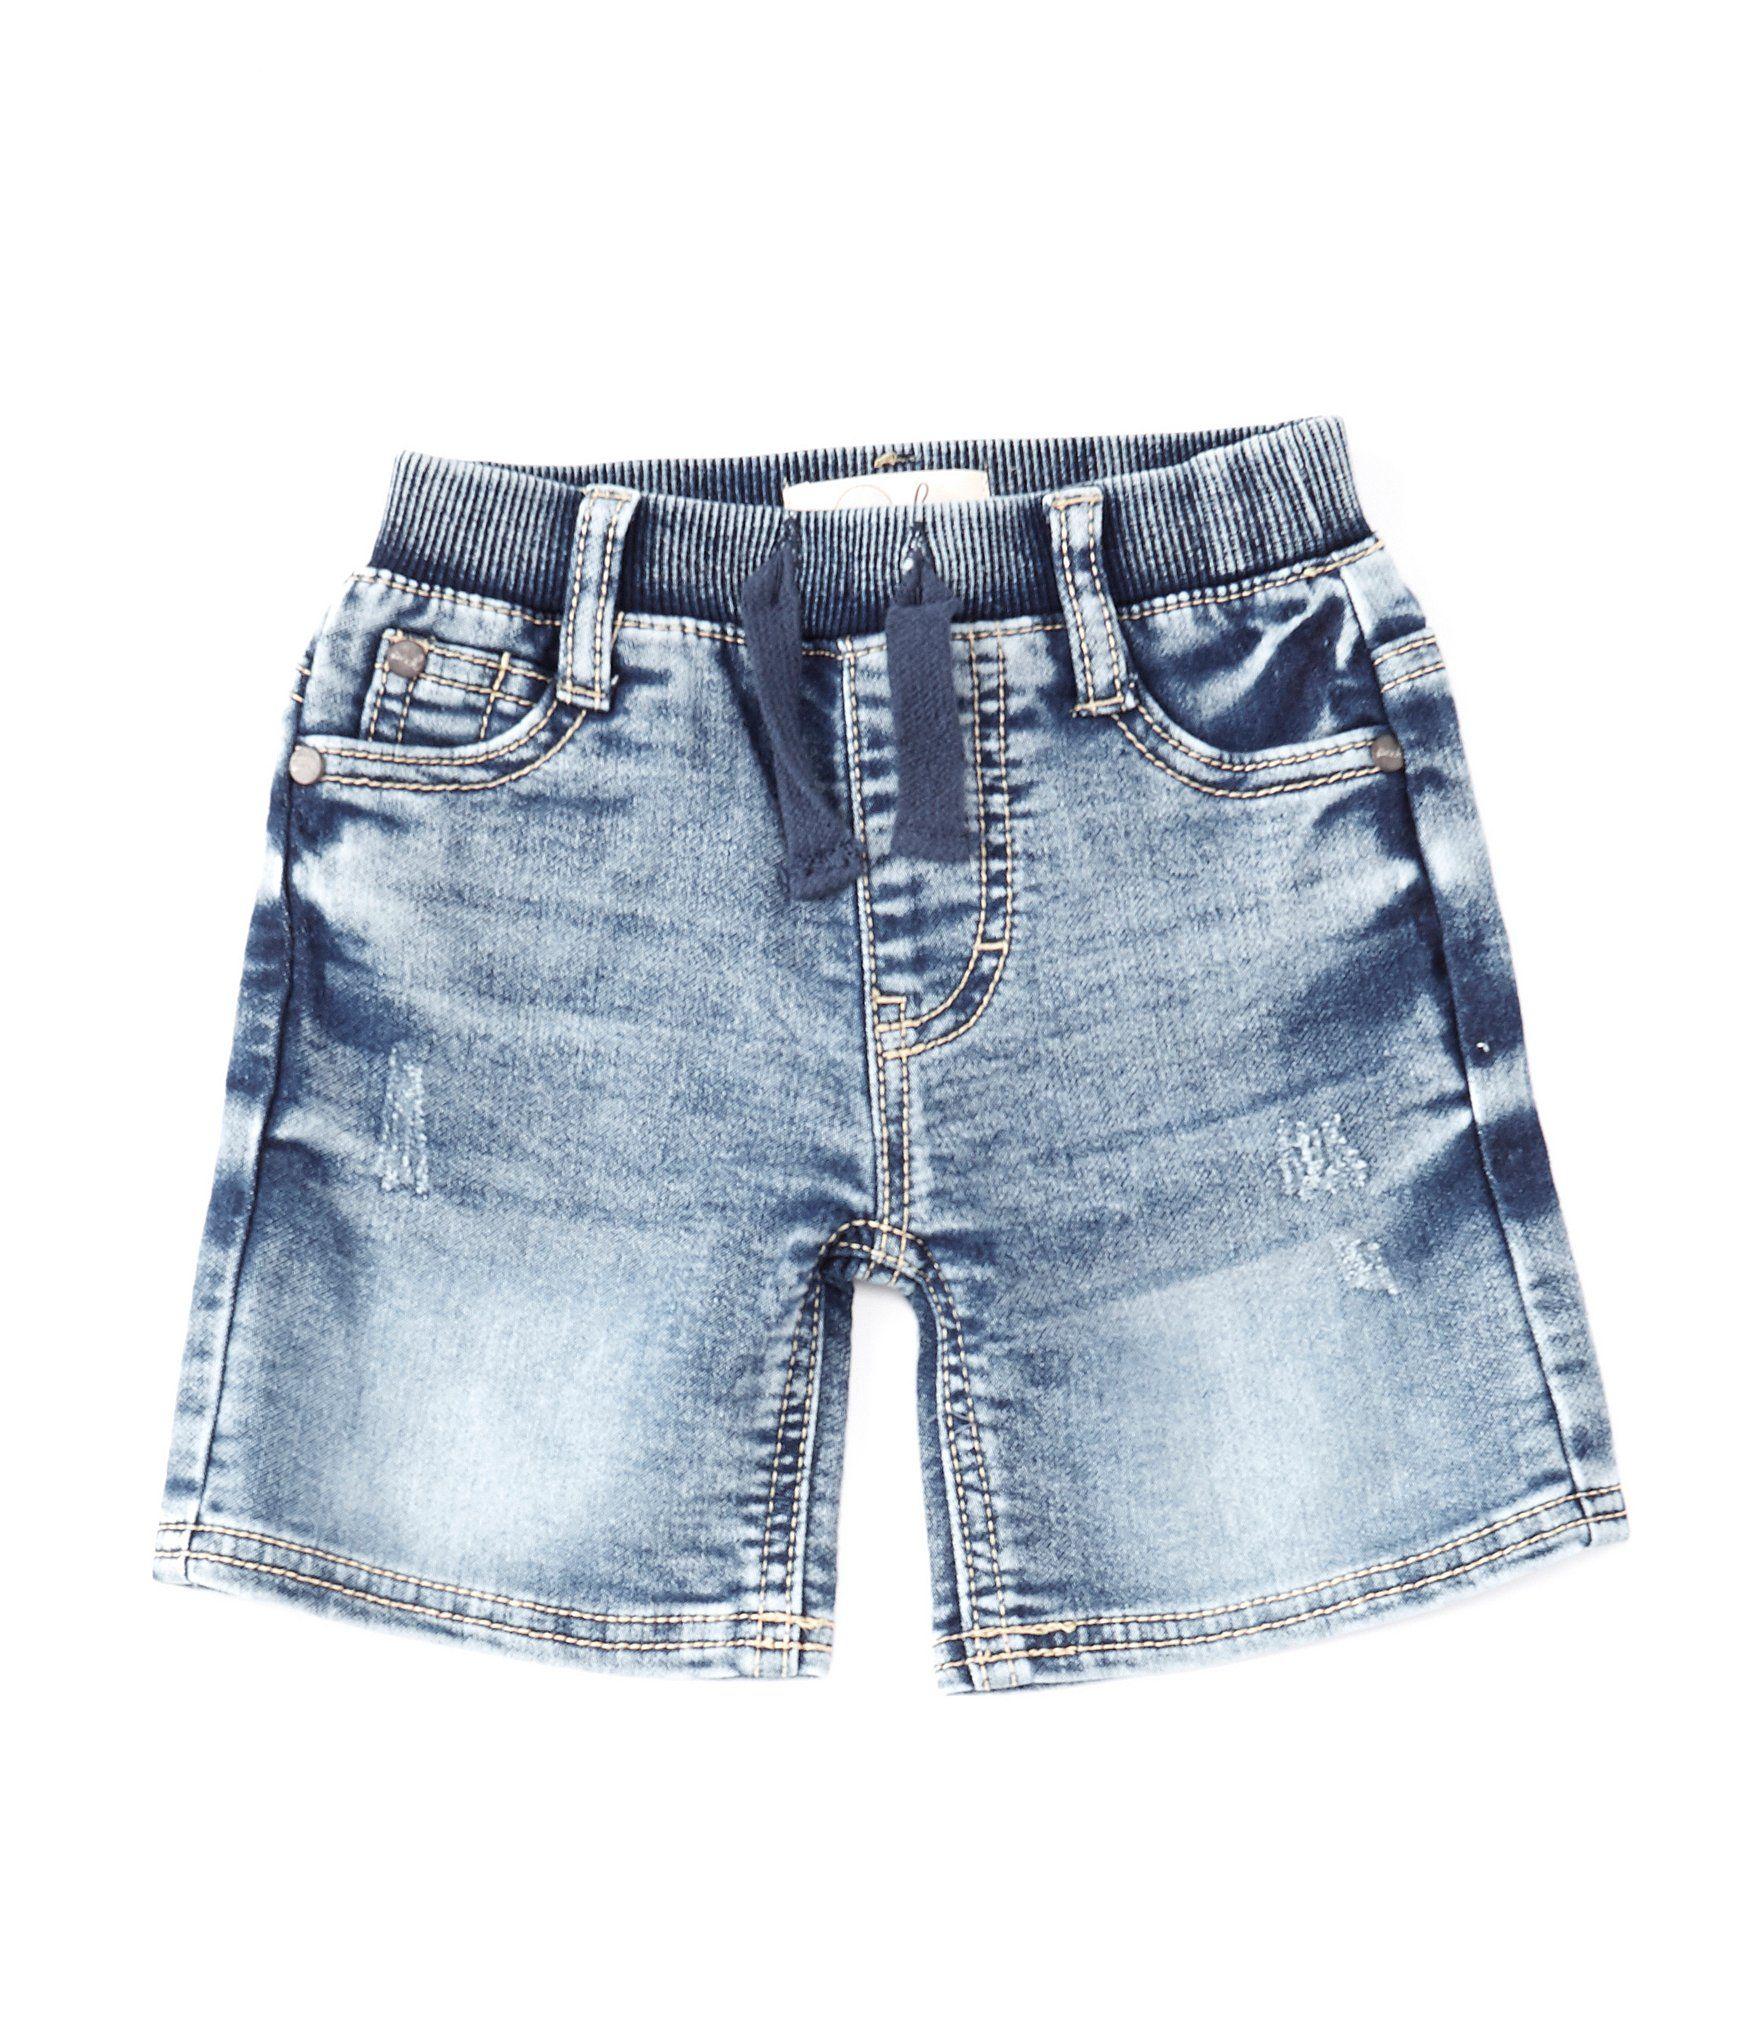 Peek LittleBig Boys 2T-12 Robert Knit-Denim Shorts – Dark Stone 12